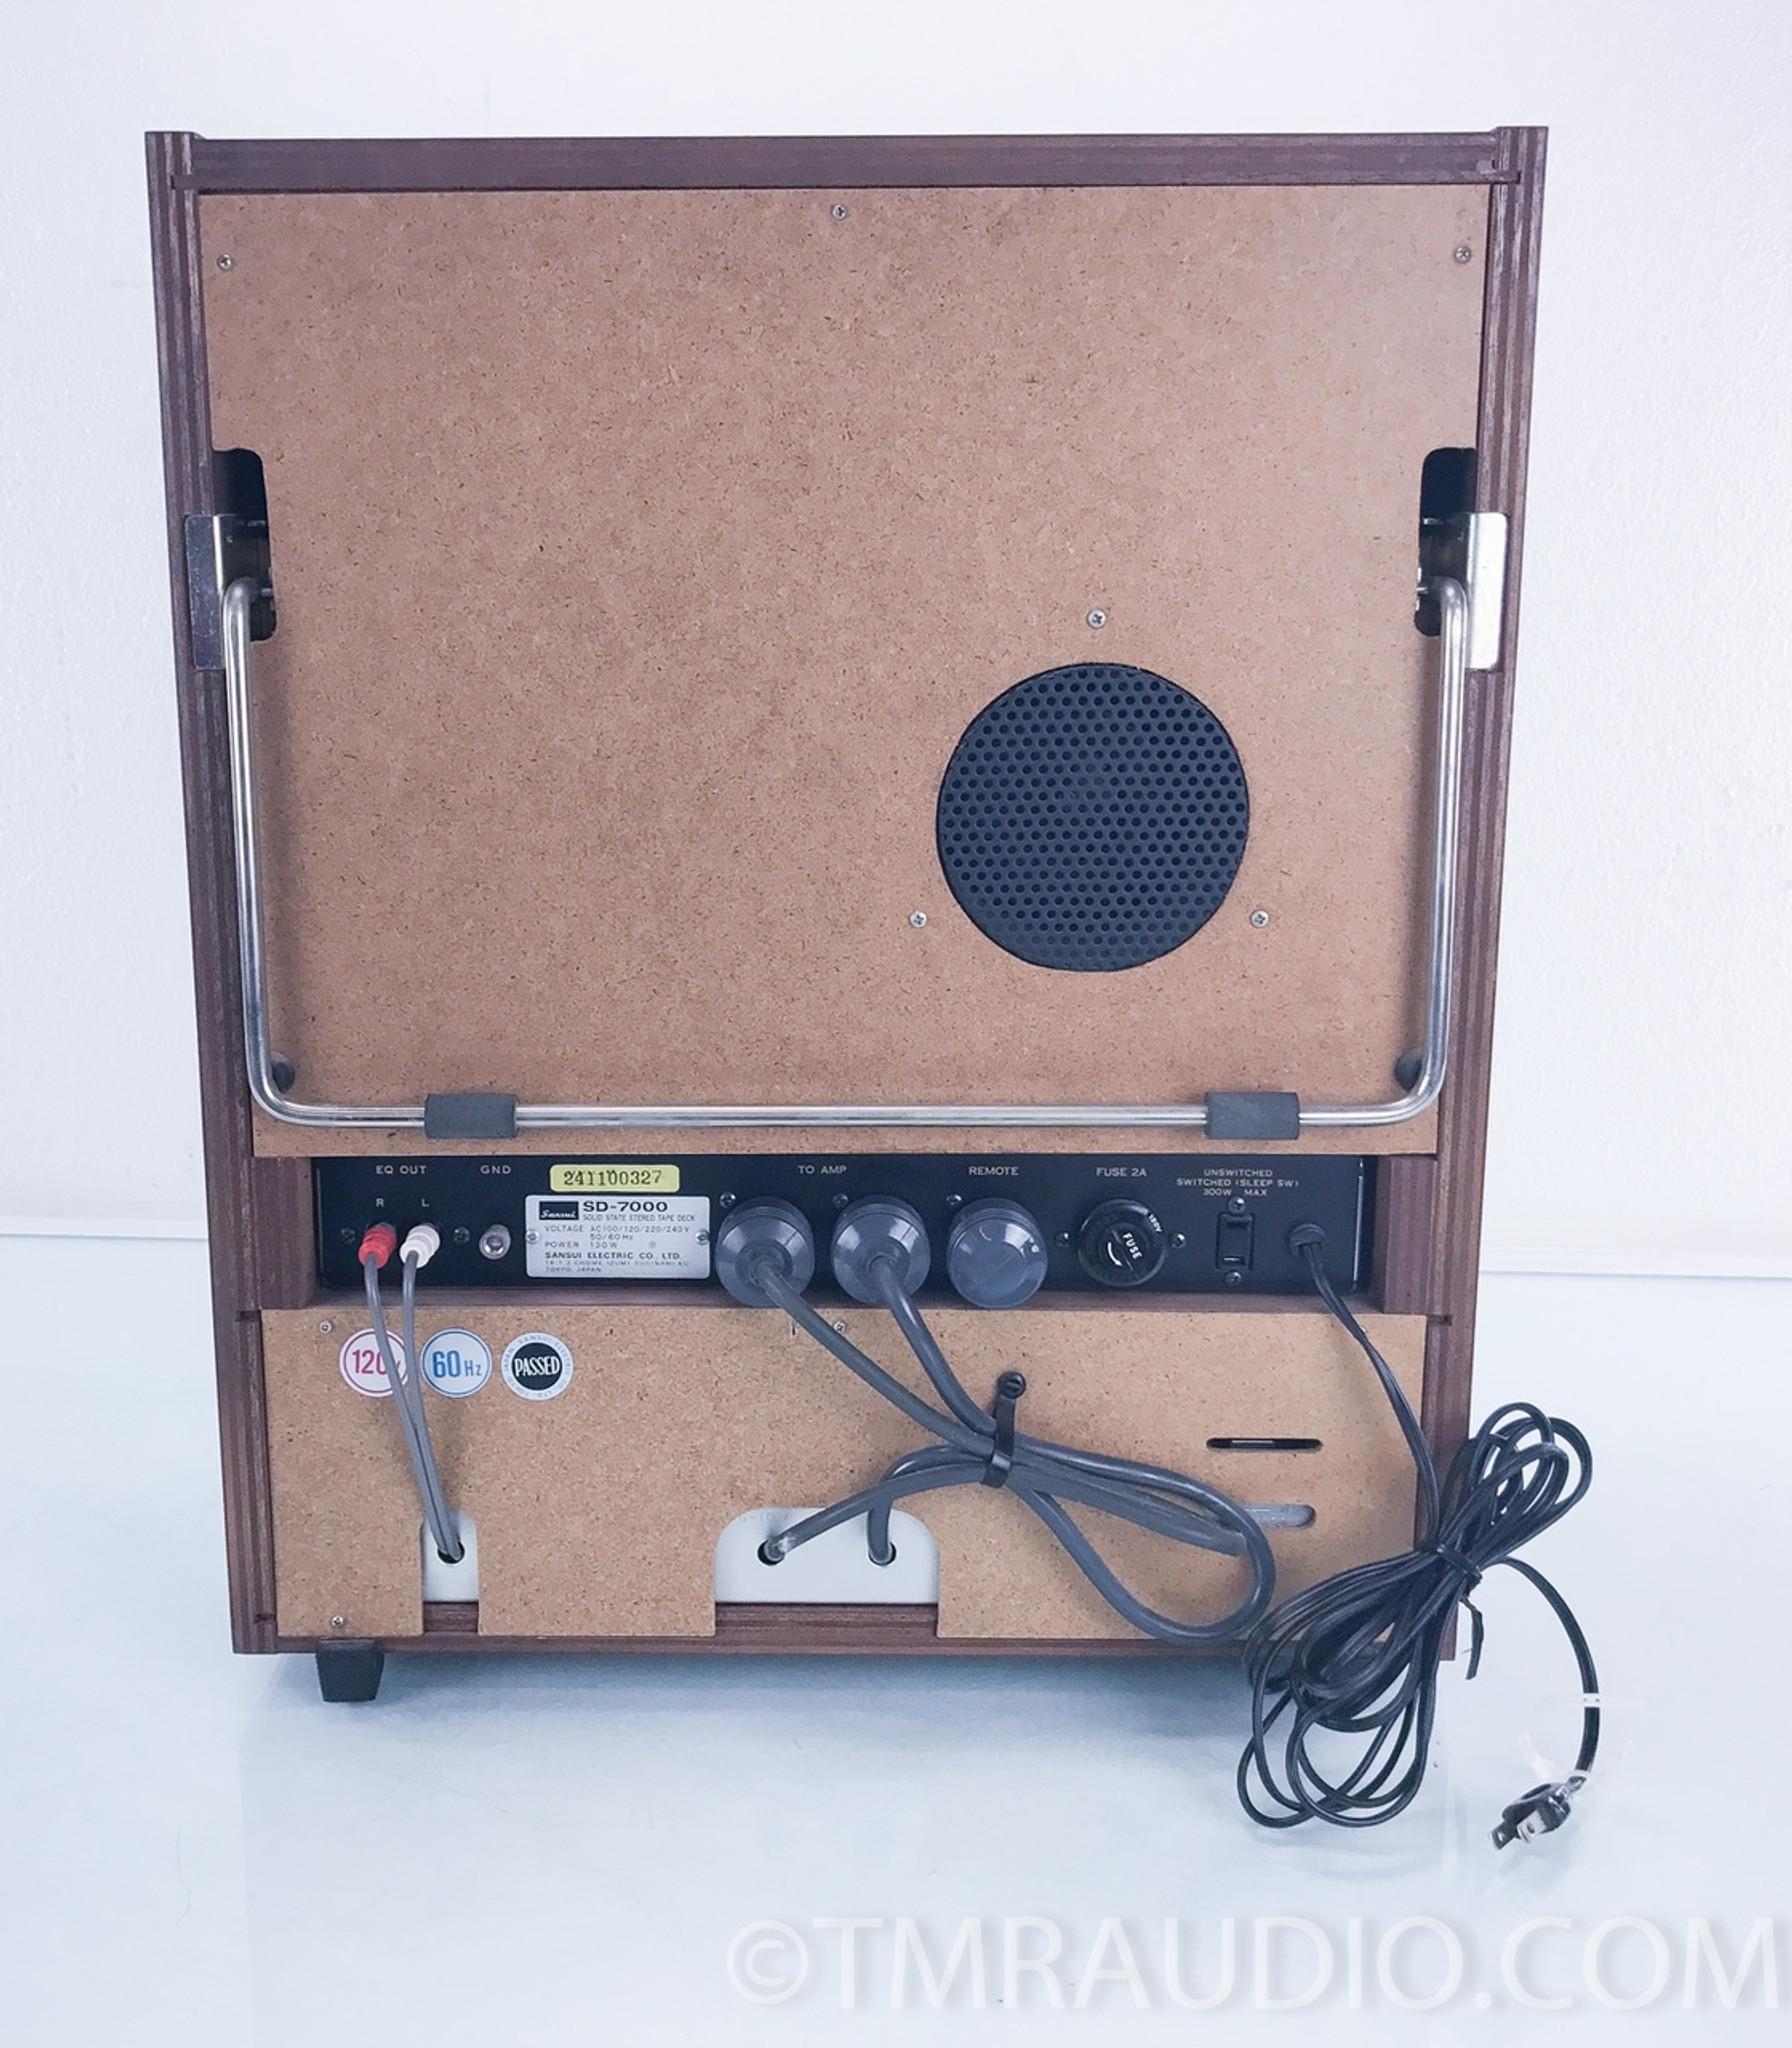 Sansui SD-7000 Vintage Reel to Reel Tape Recorder / Player